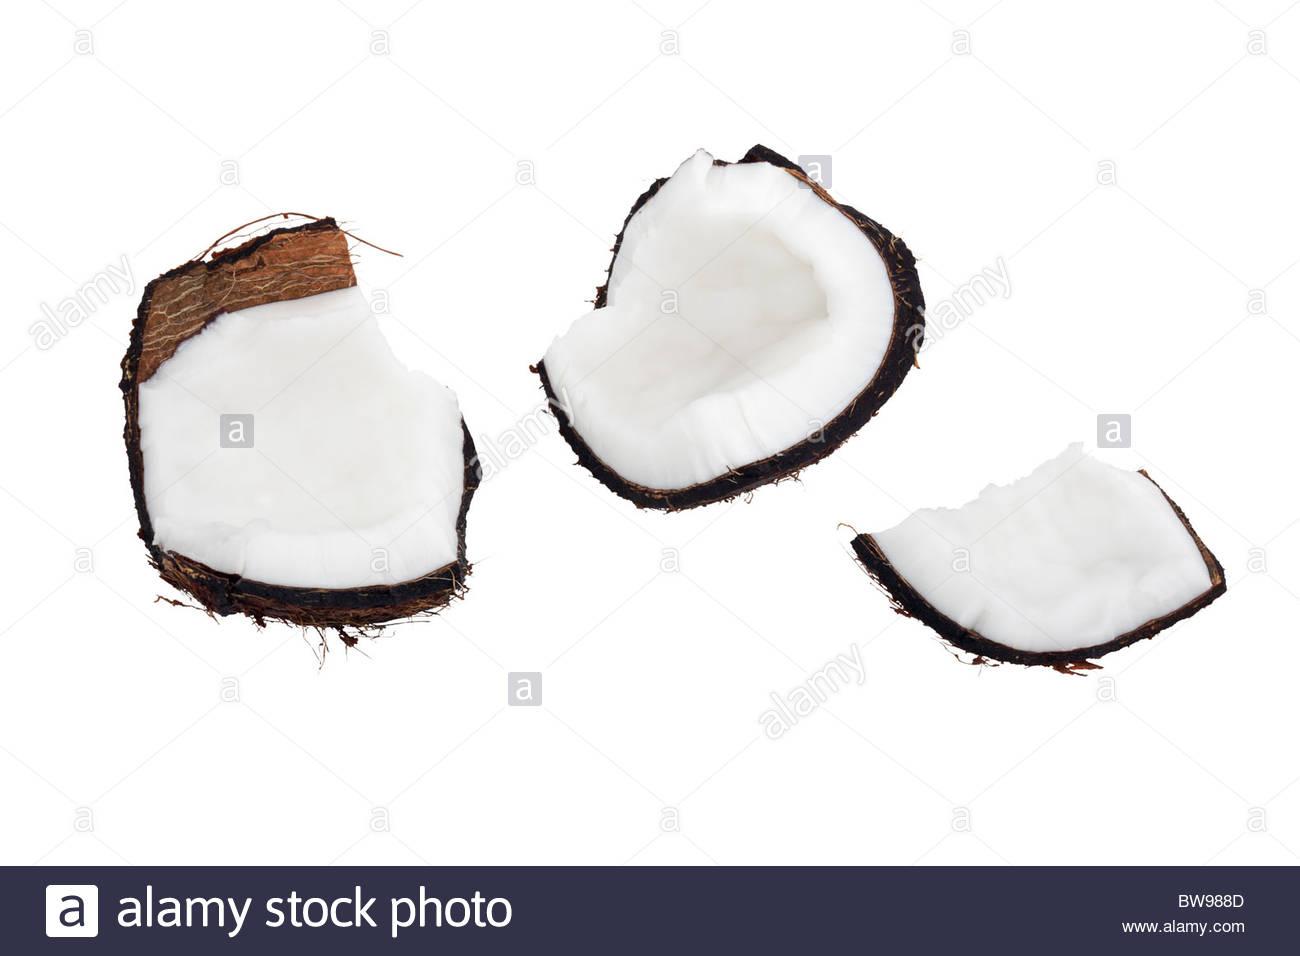 Coconut - Stock Image